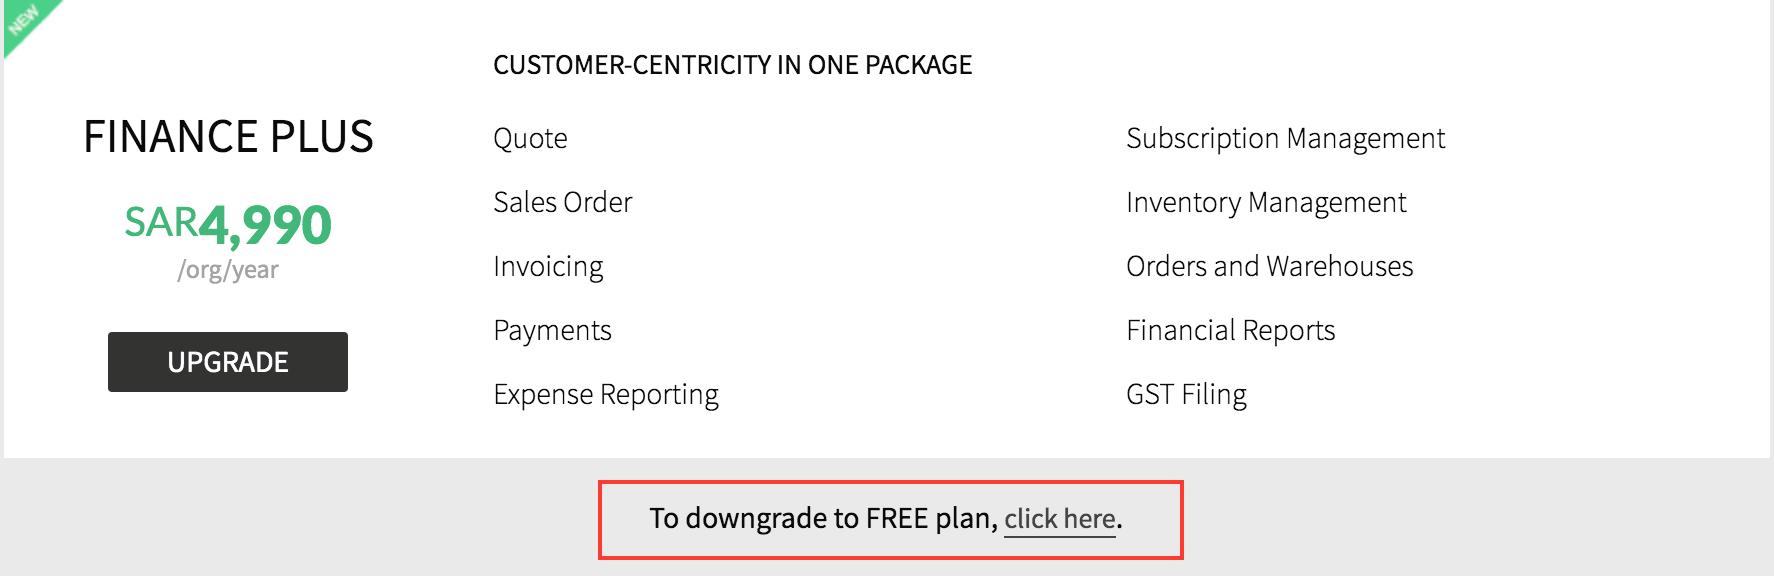 Downgrade Plan